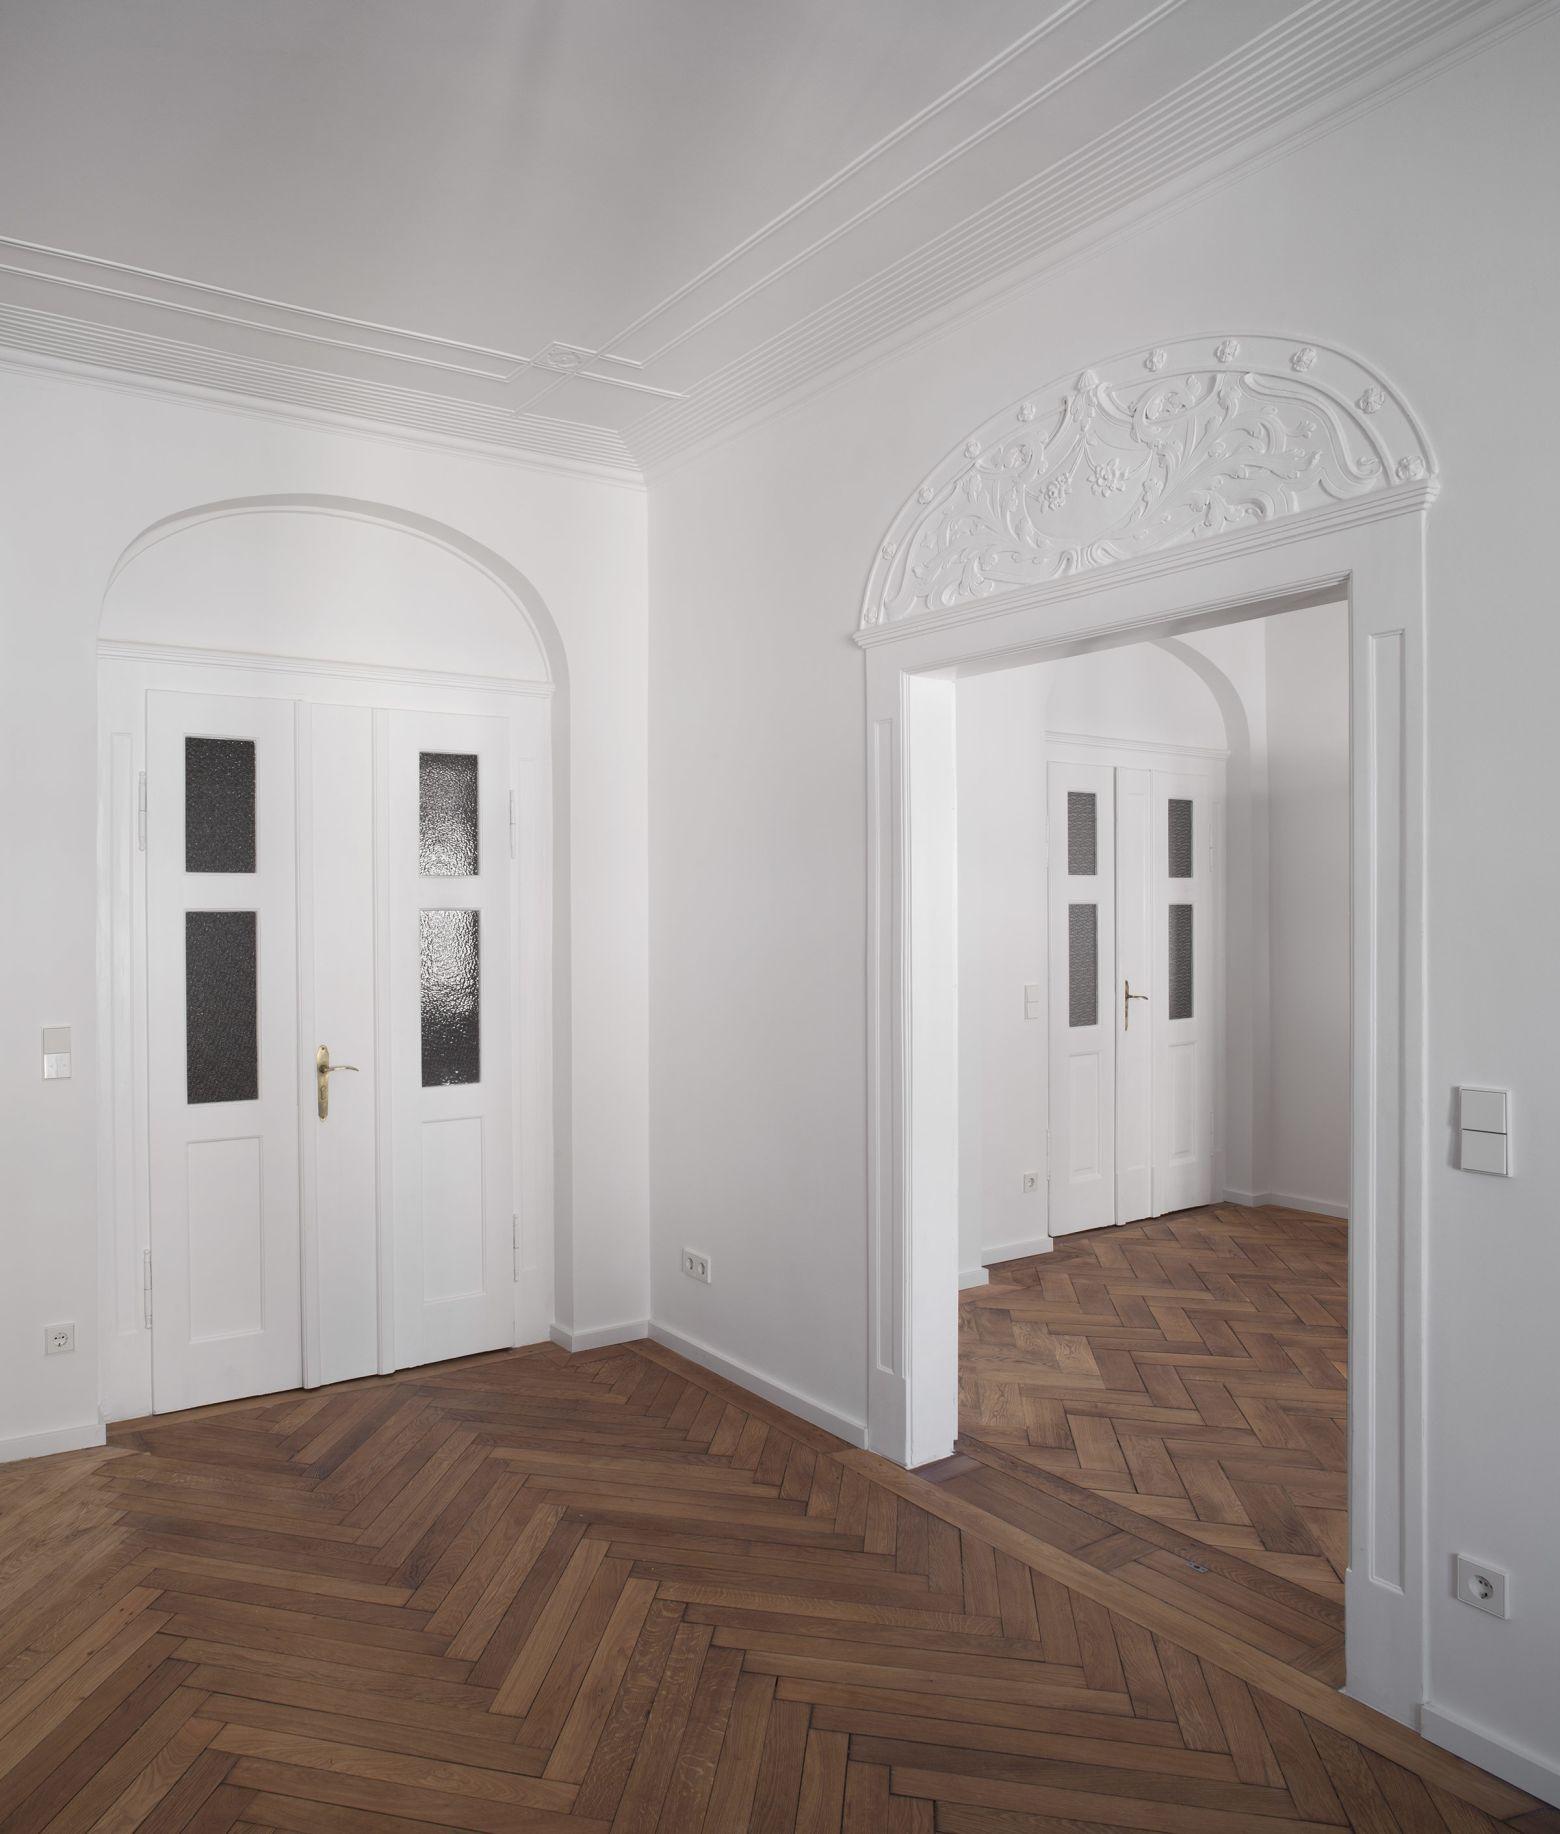 Doppeltüren zum Flur